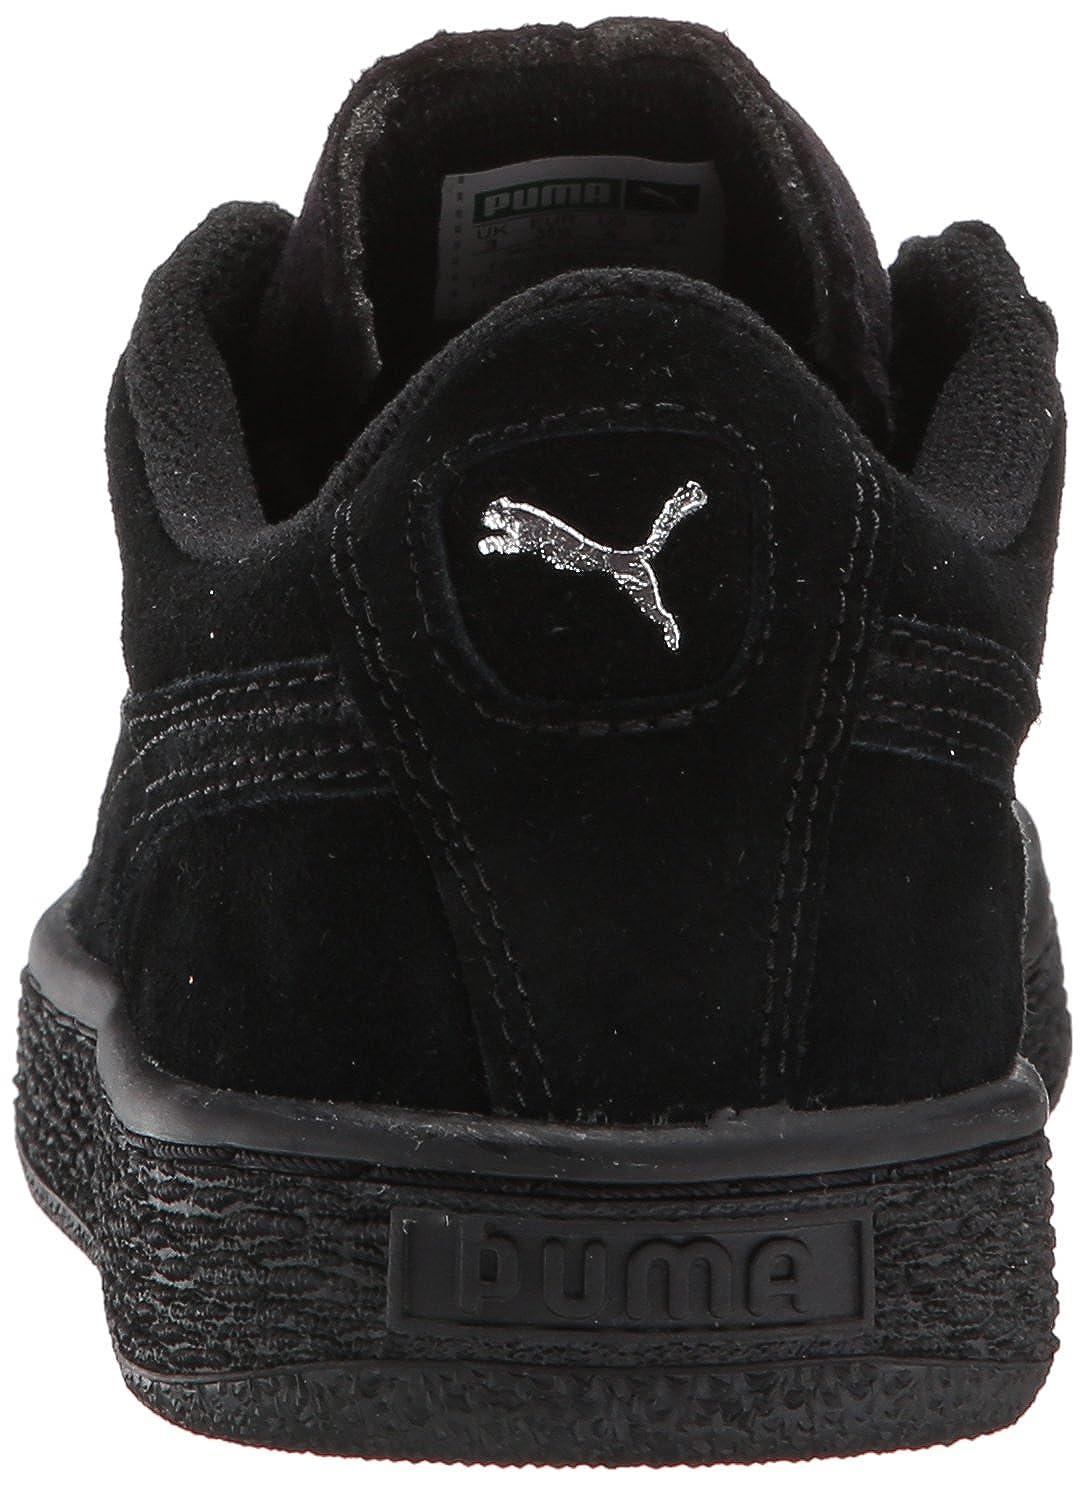 PUMA Suede JR Sneaker 59517bf81